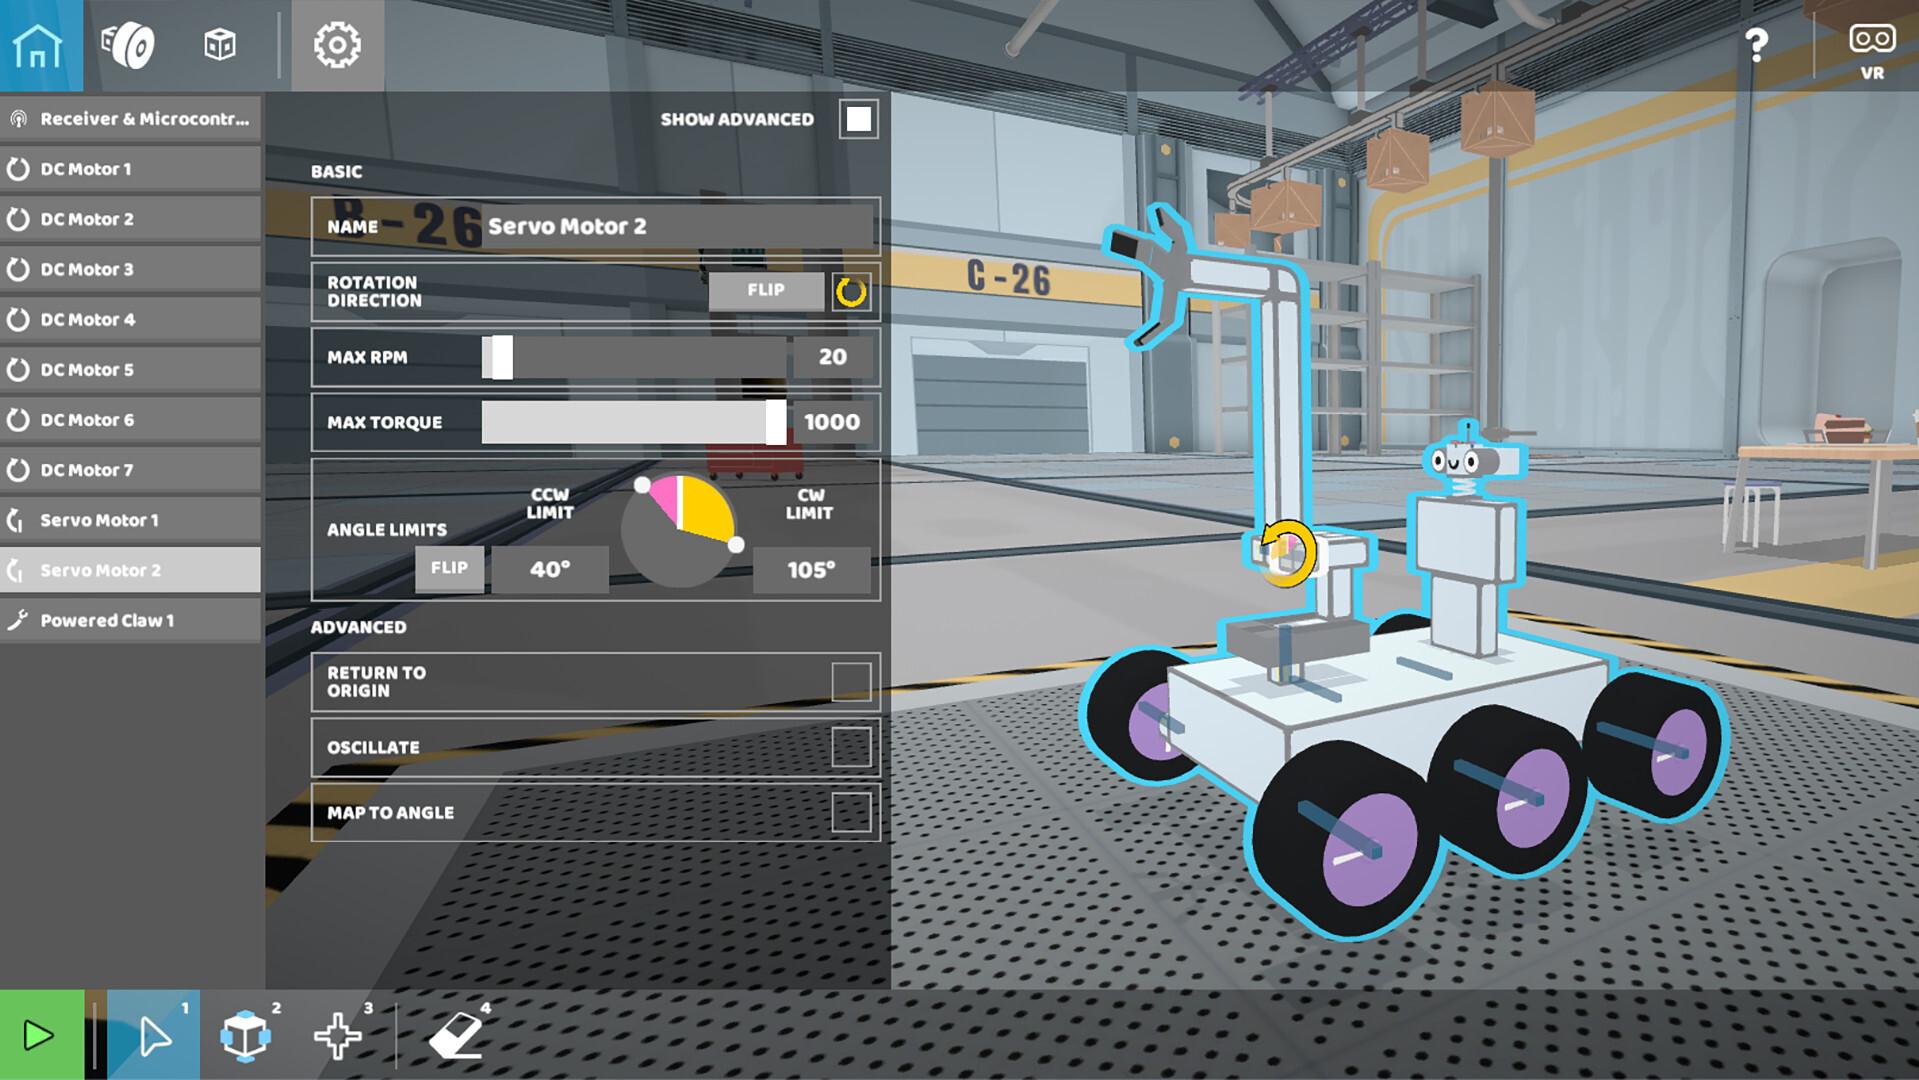 roboco screenshot with robot visible